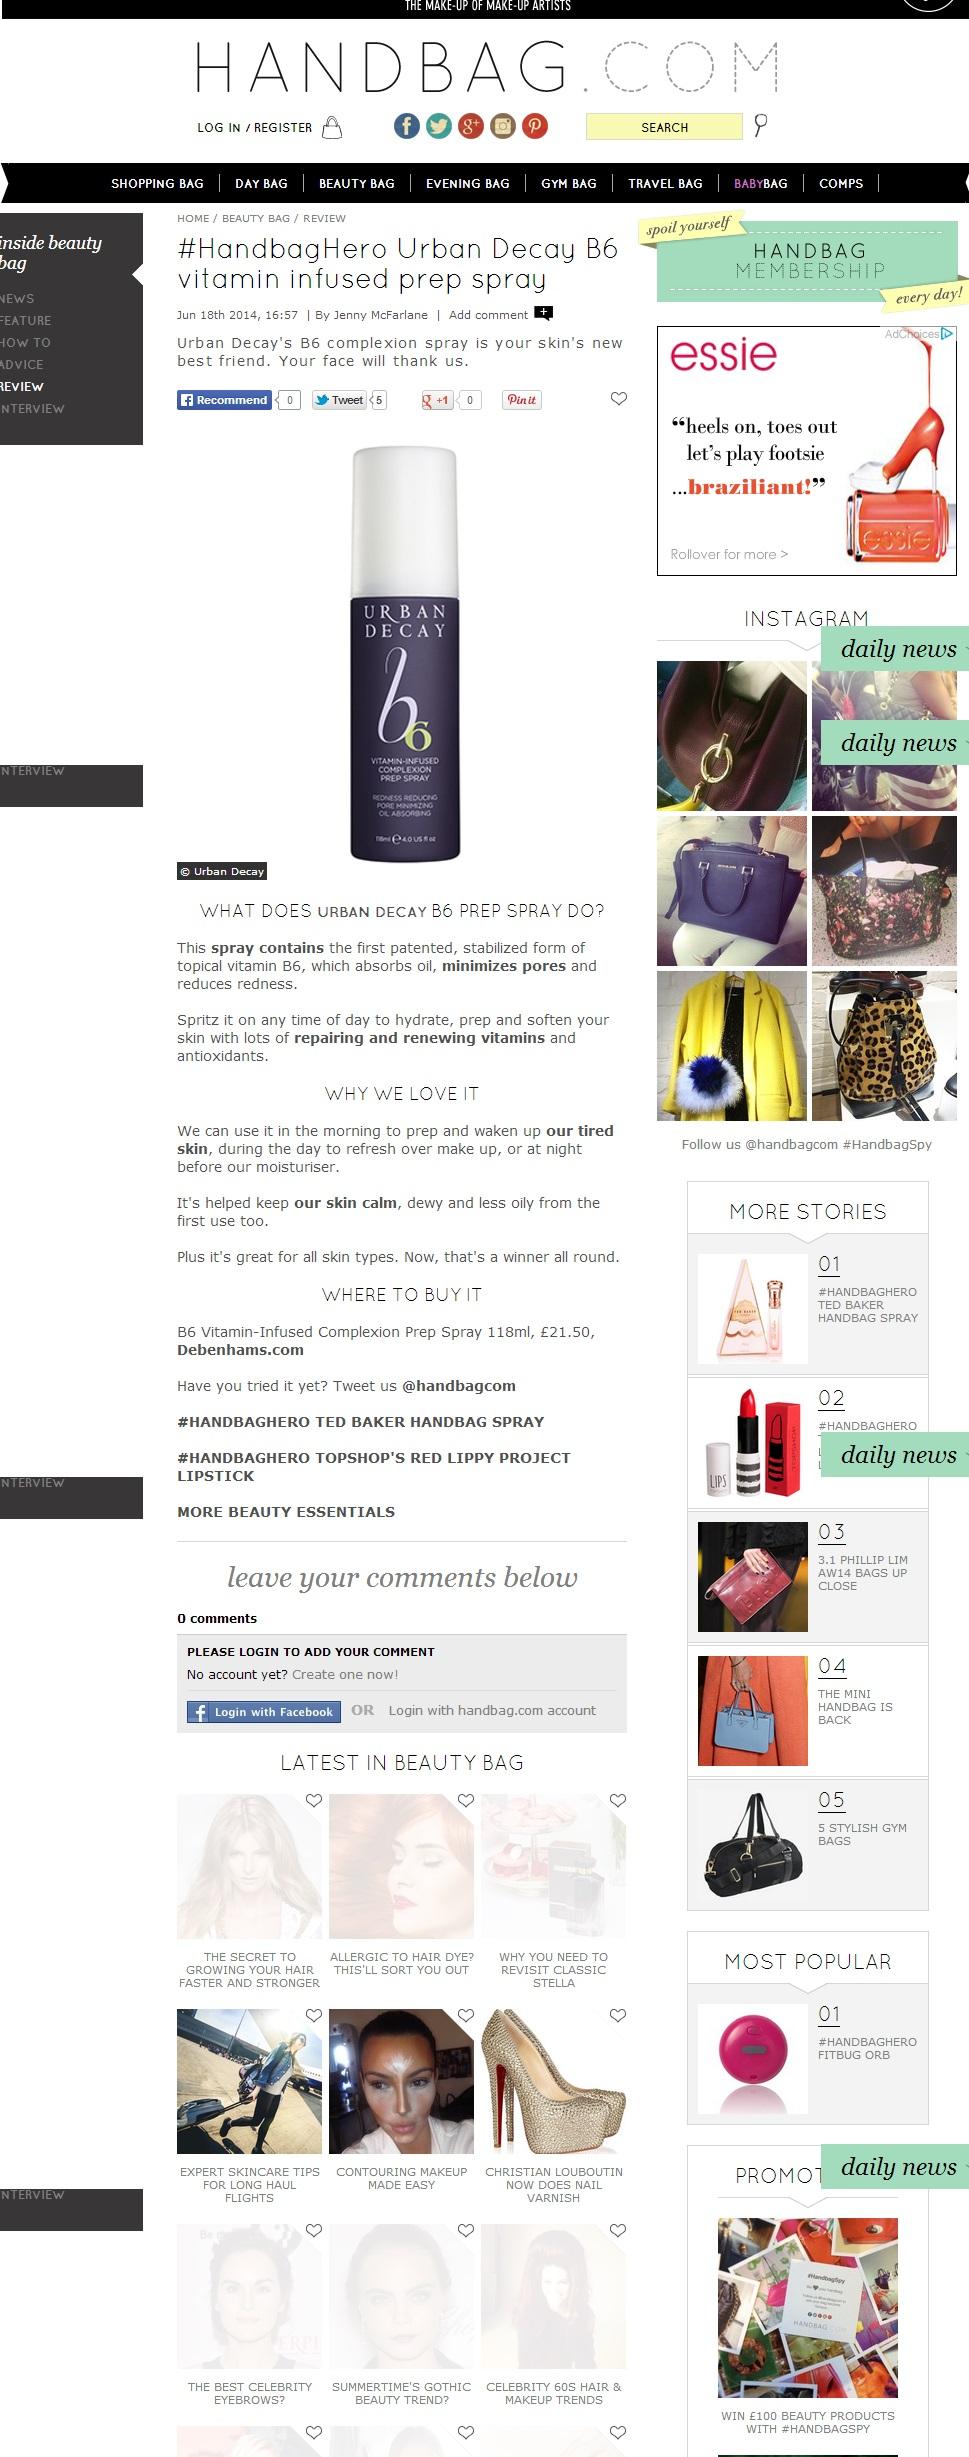 screencapture-www-handbag-com-beauty-bag-review-a578755-handbaghero-urban-decay-b6-vitamin-infused-prep-spray-html